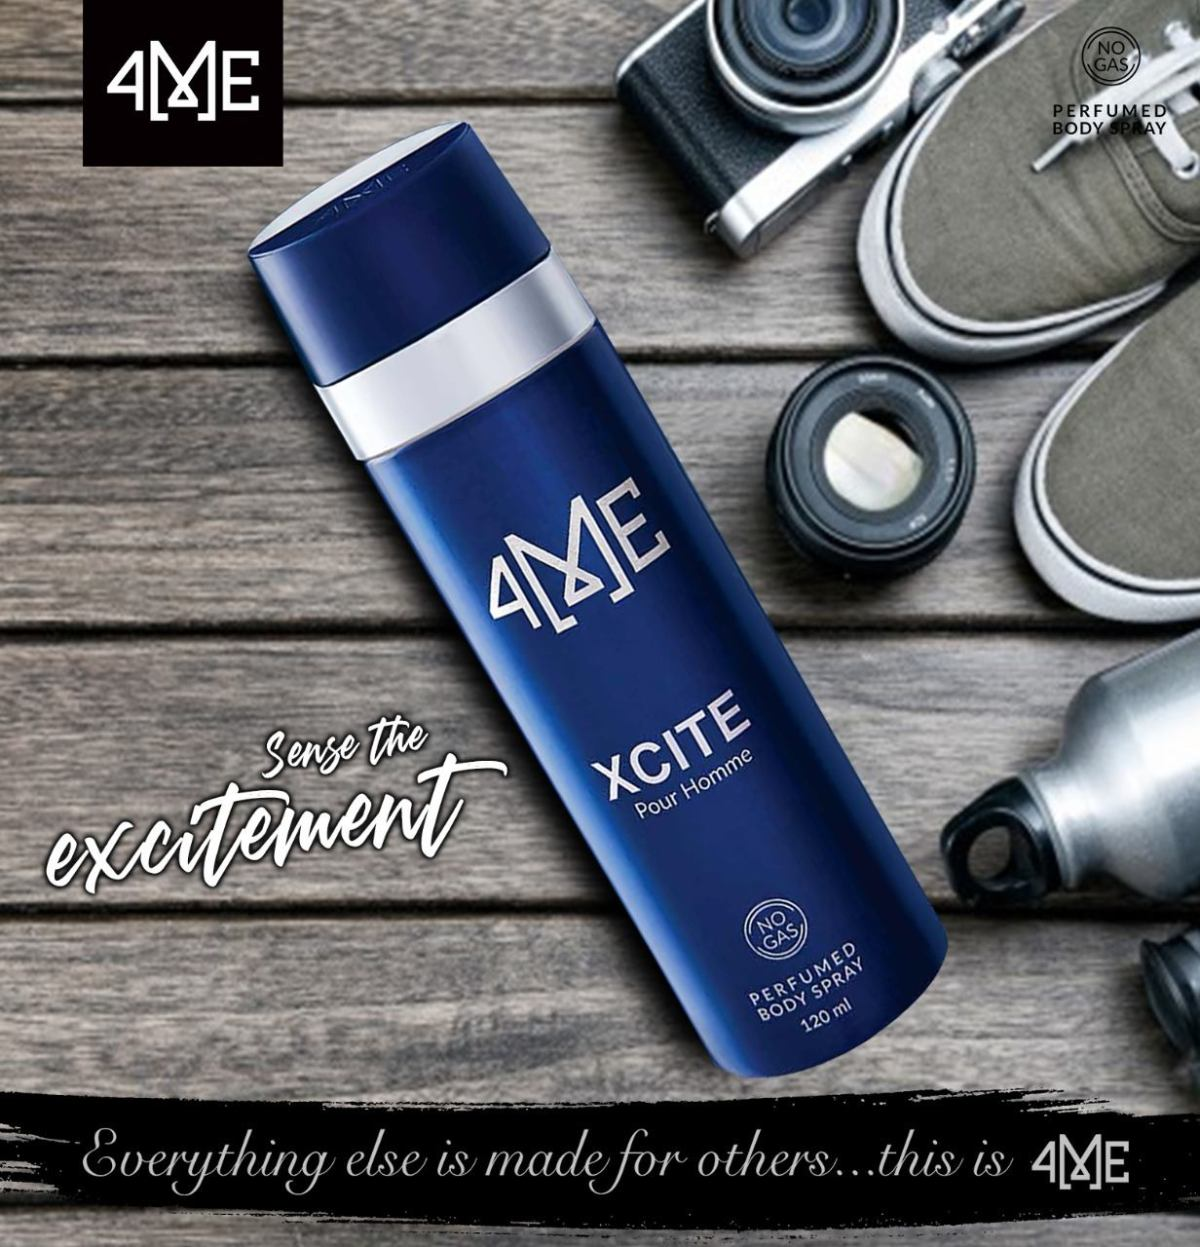 xcite body spray